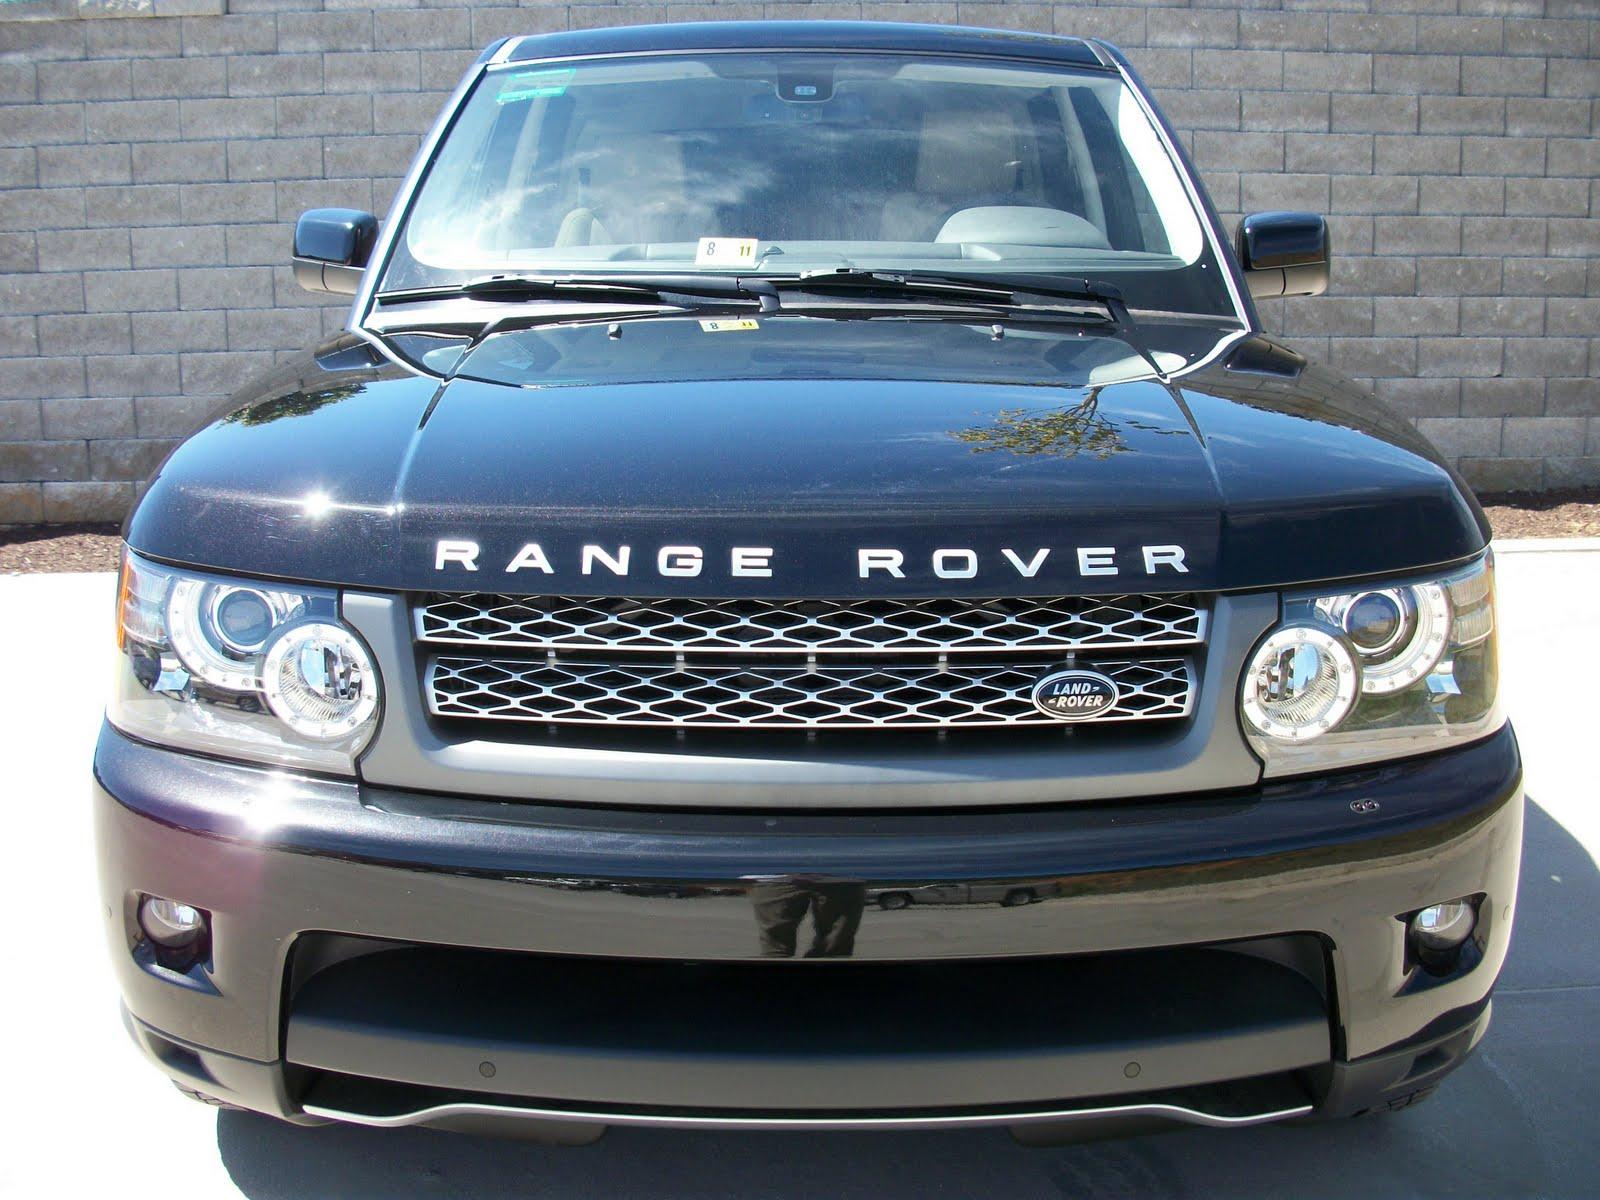 2010 land rover range rover sport supercharged i take pictures of cars. Black Bedroom Furniture Sets. Home Design Ideas